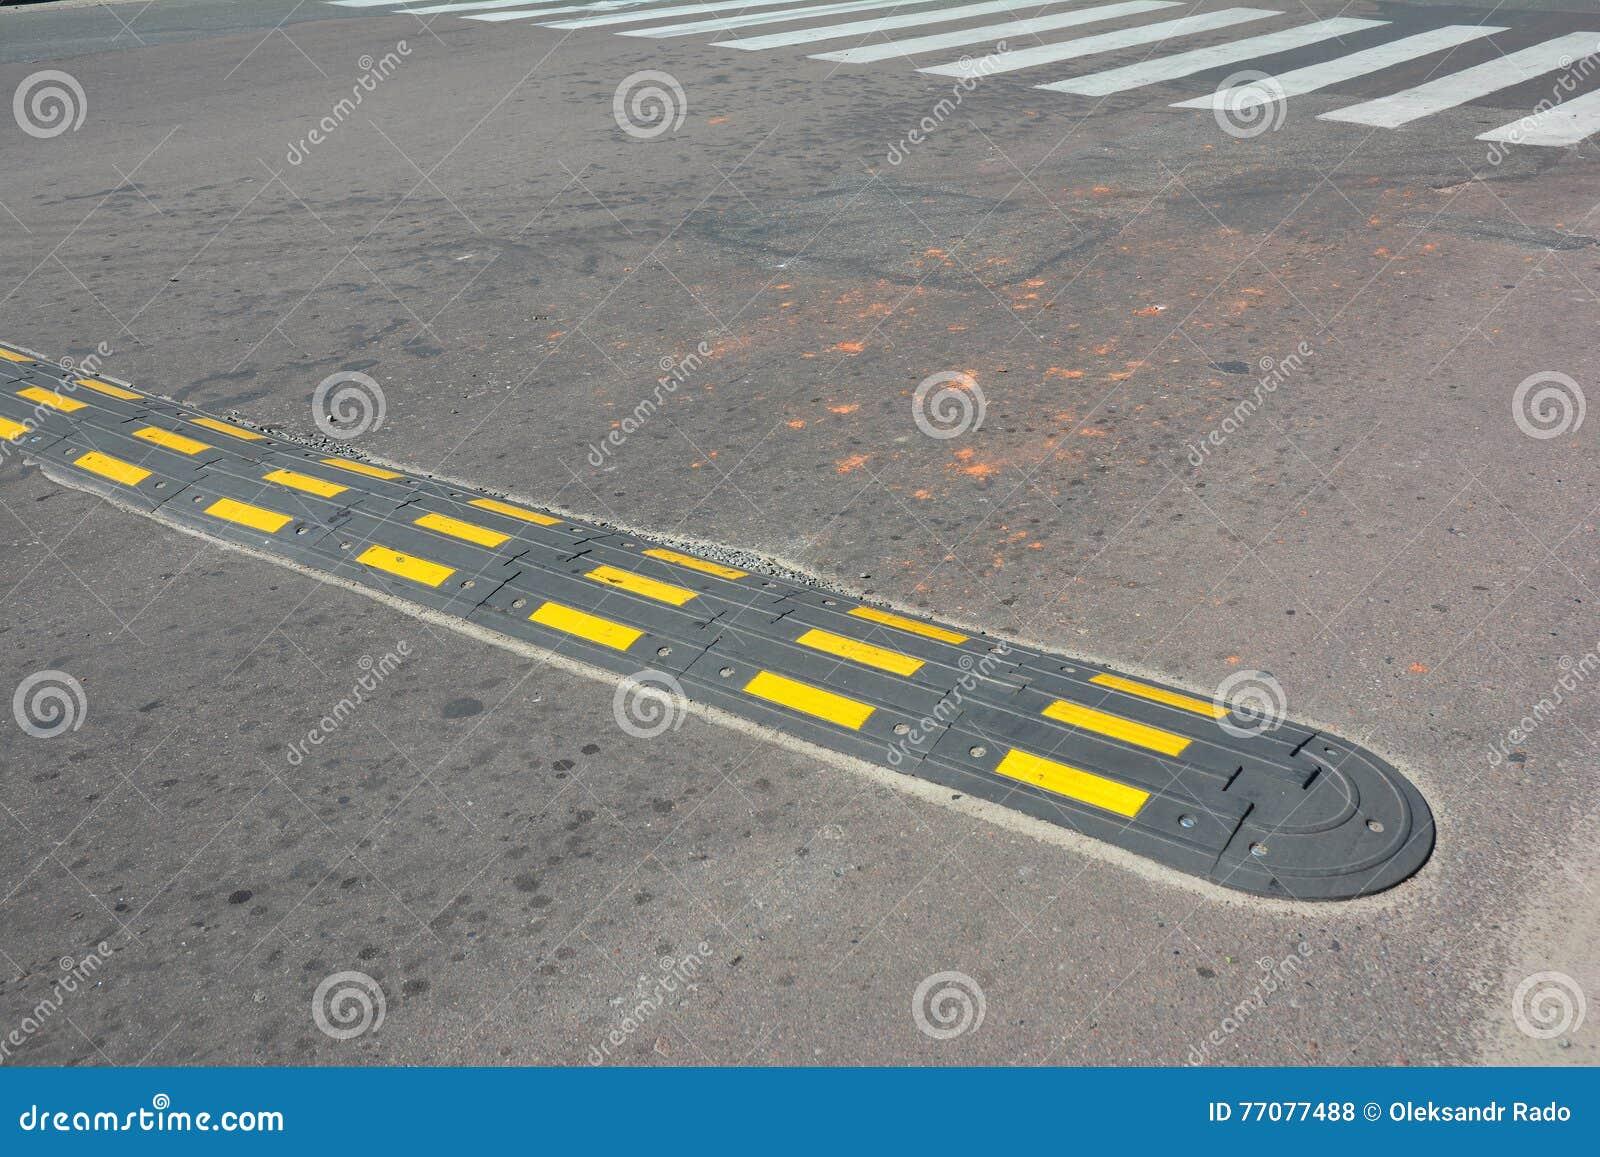 how to make a speed bump asphalt